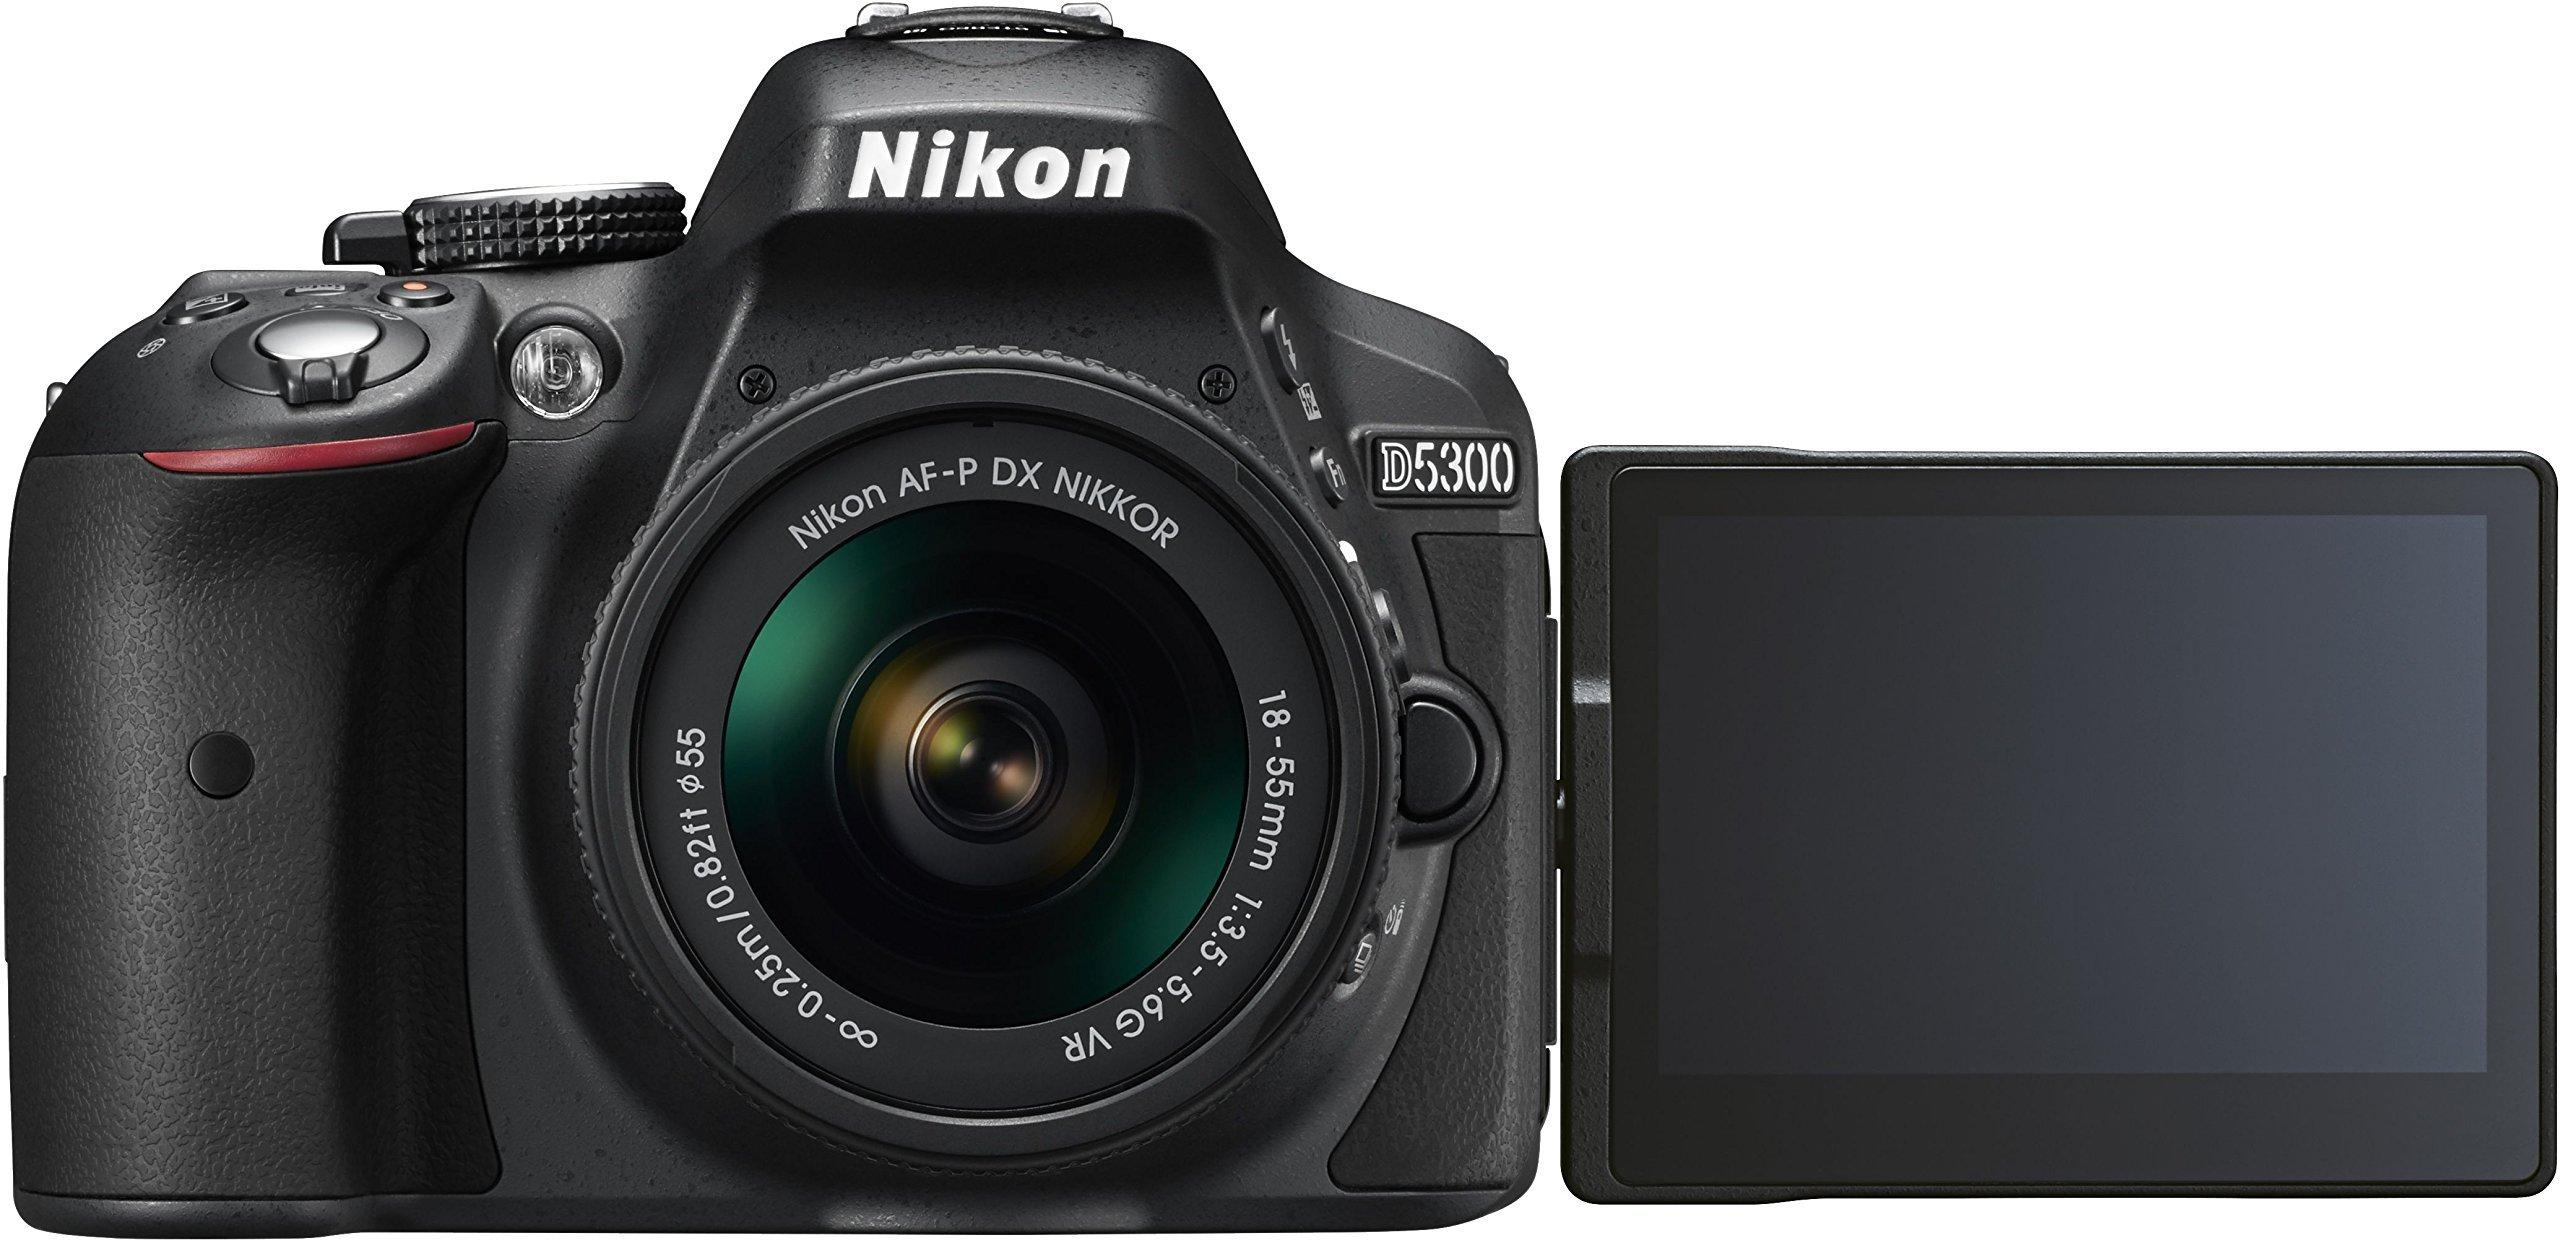 Nikon D5300 Digital SLR Camera - Black (24.2 MP, AF-P 18-55mm VR Lens Kit) 3-Inch LCD Screen - International Version (No Warranty) by Nikon